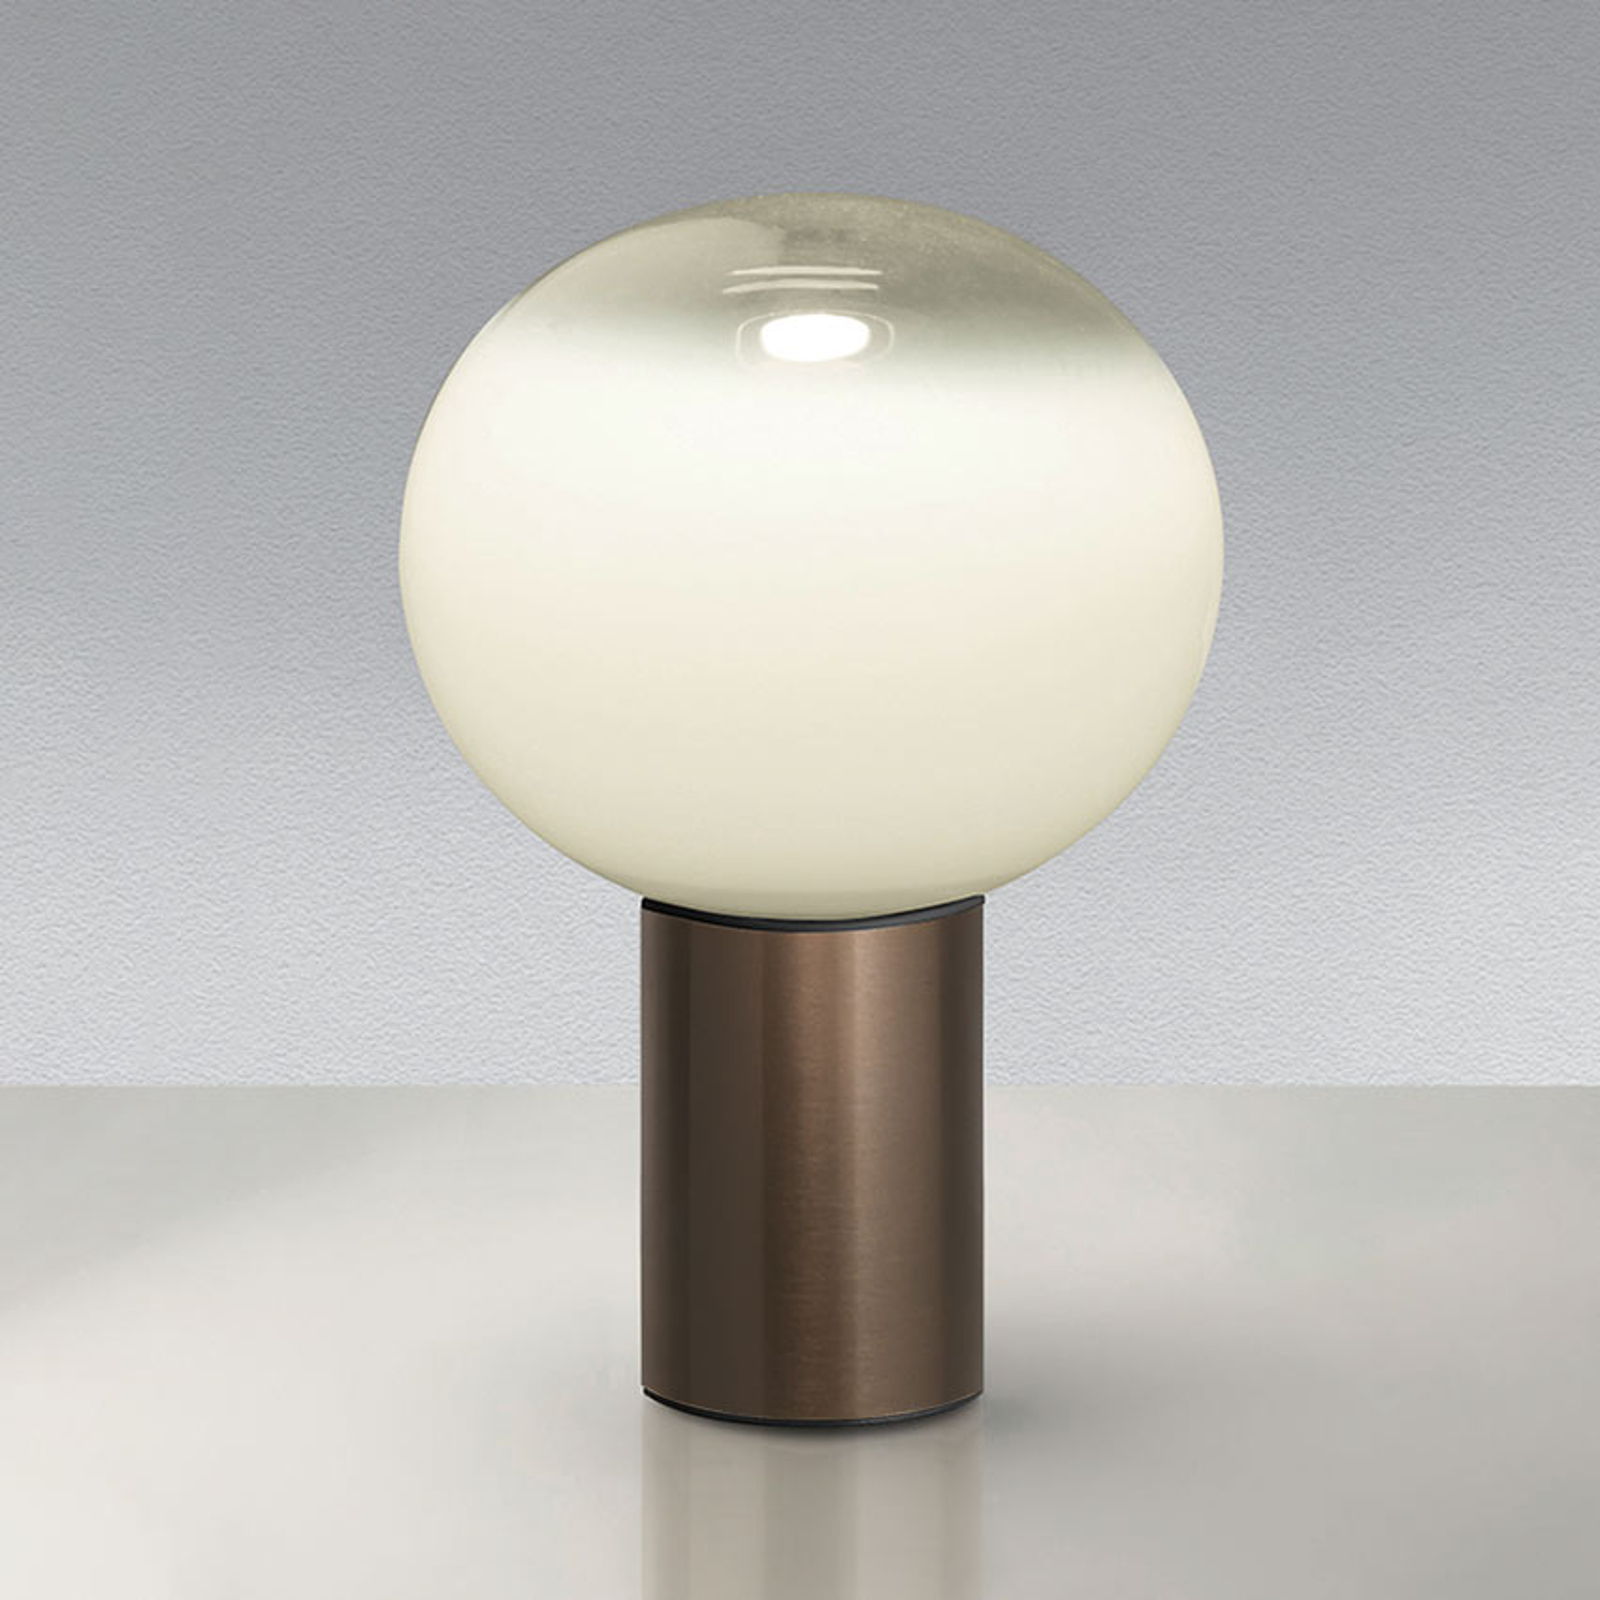 Artemide Laguna 16 lampa stołowa, brąz